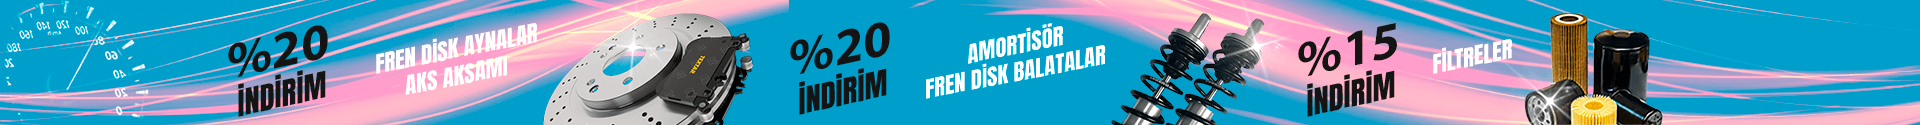 Amörtisör Fren Disk Aynalar Aks Aksamı Balata Filtre